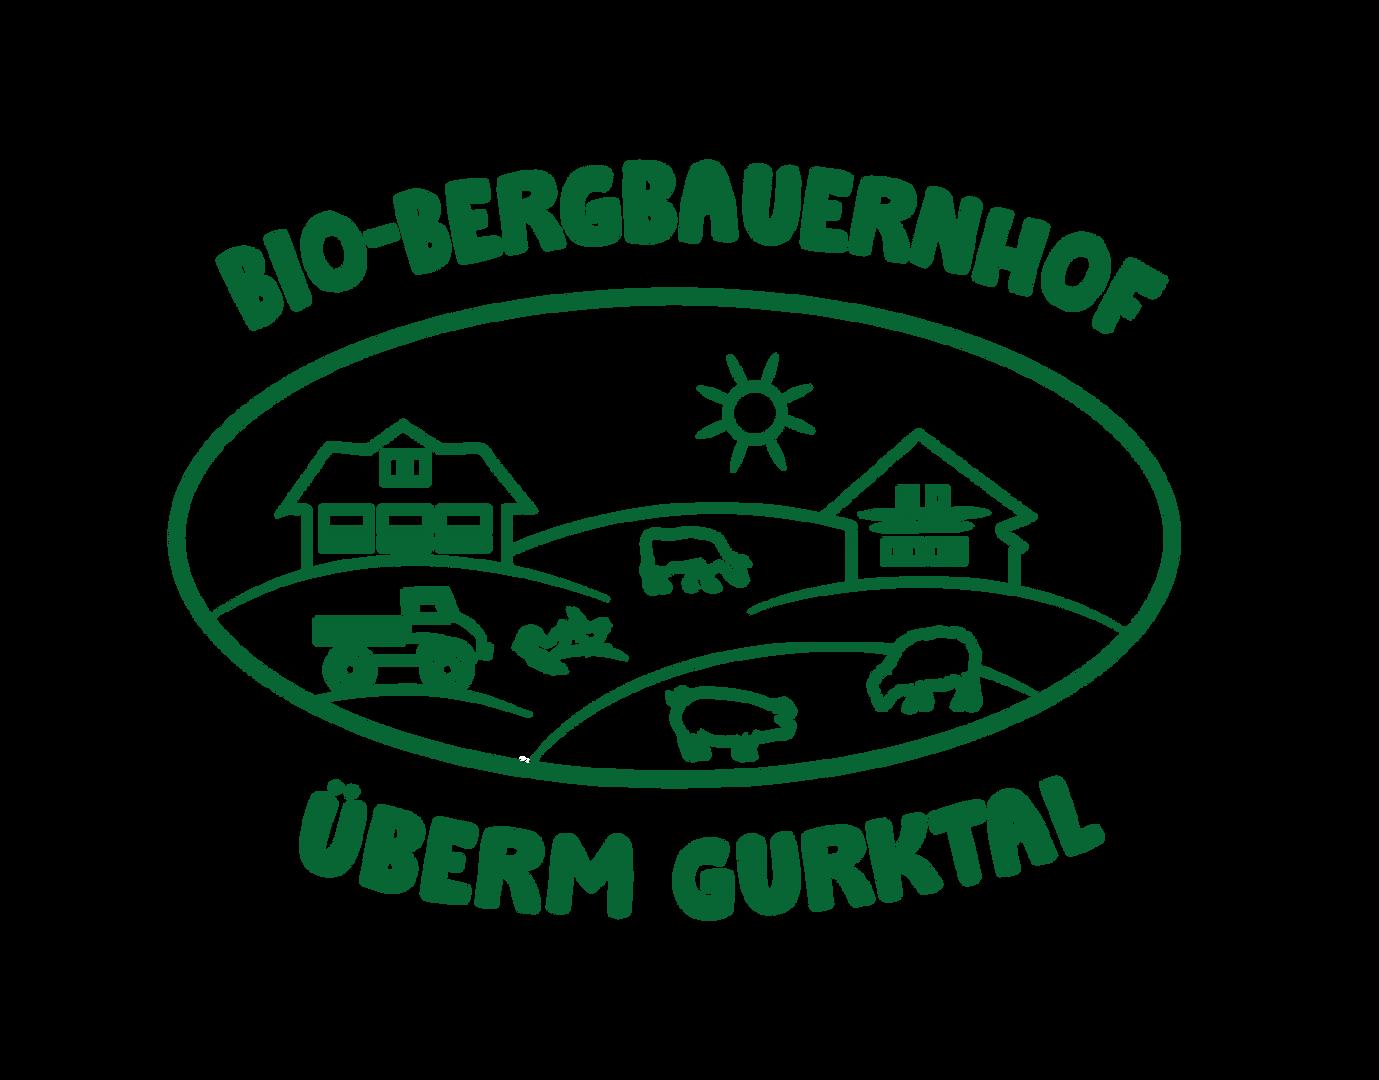 Logo_Bio_Bergbauernhof_Gurktal.png